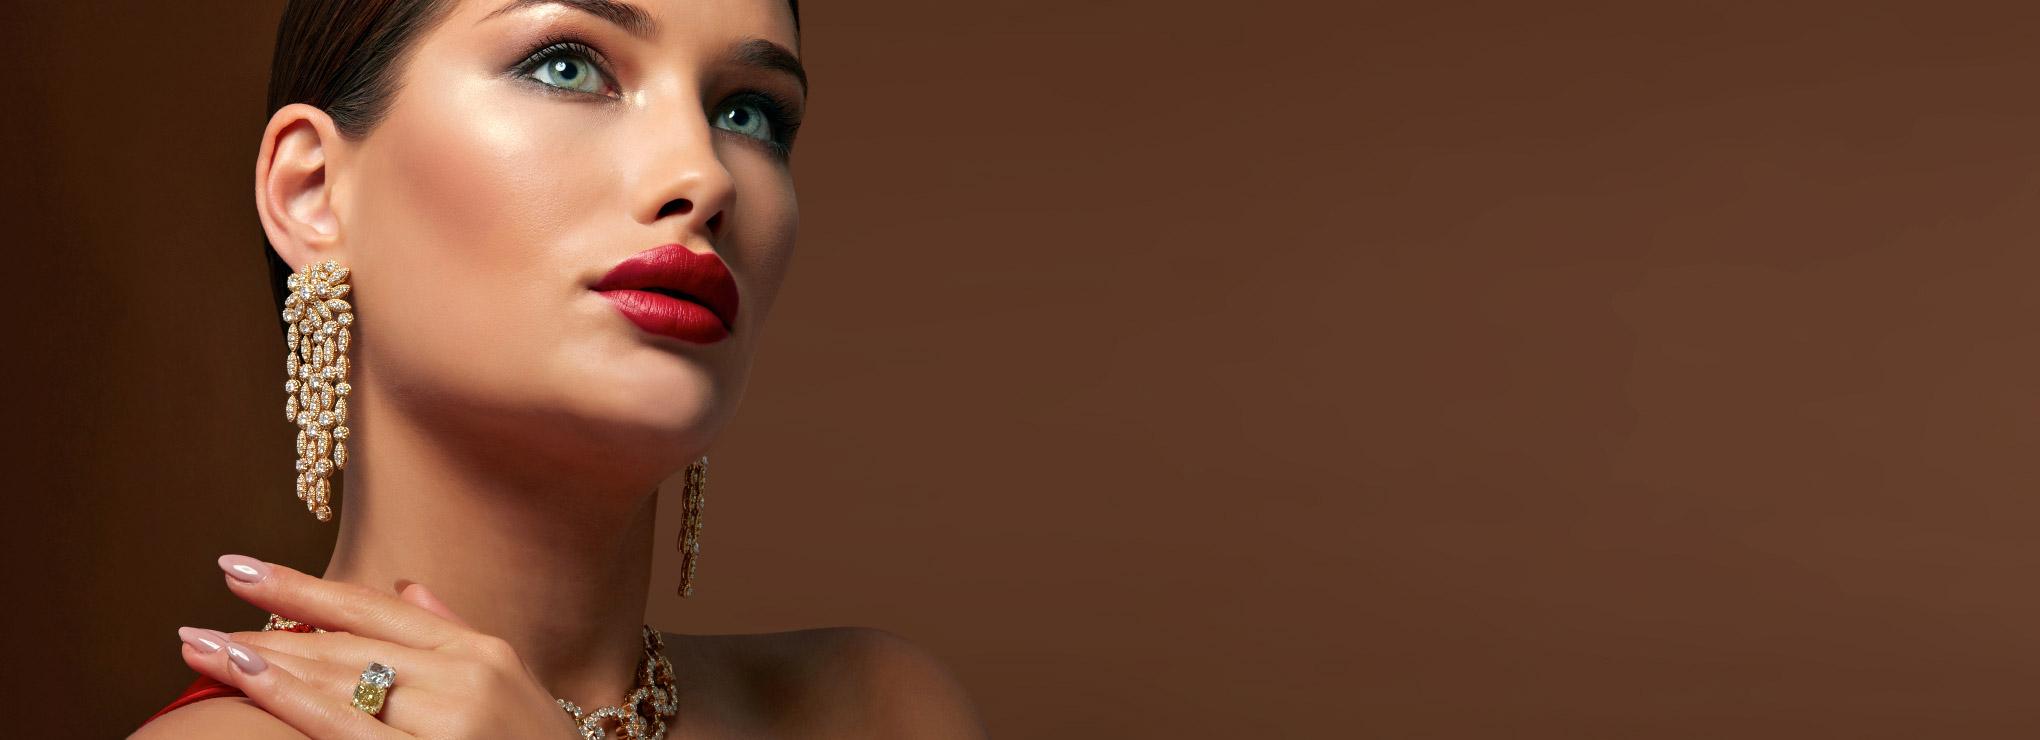 Classic and elegant earrings